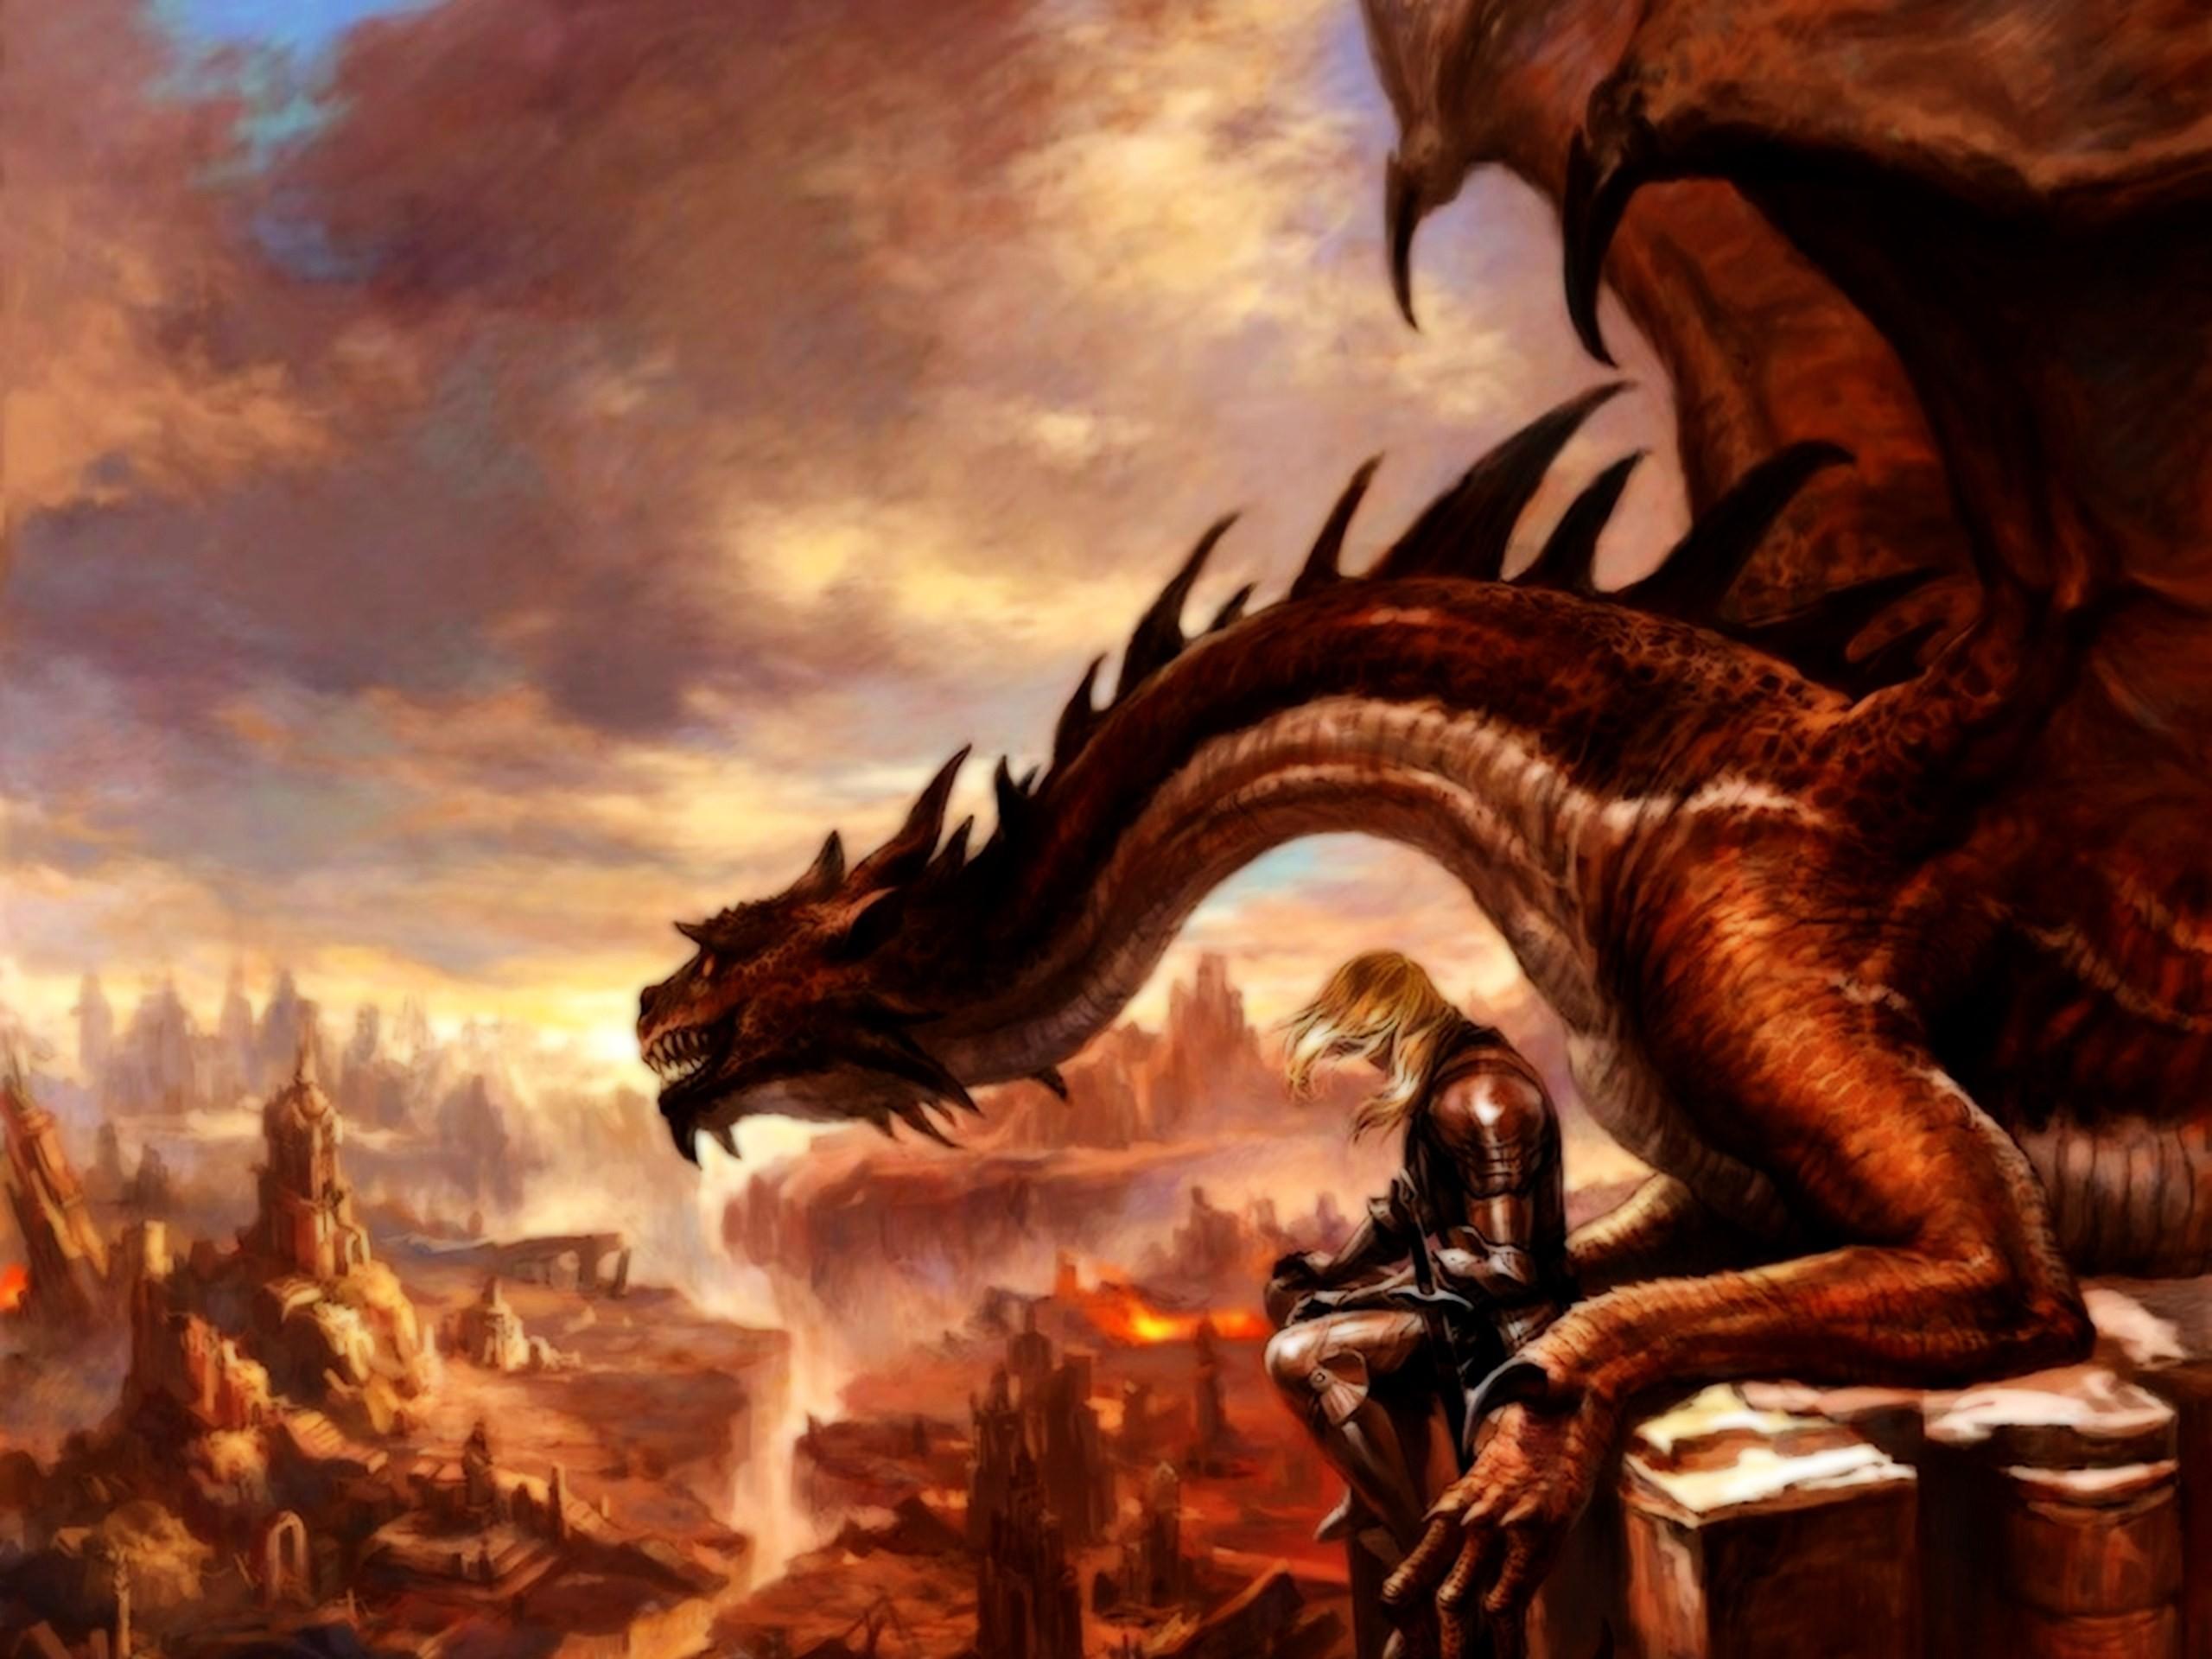 Cool Girl Saiyan Wallpaper Dragon Fantasy Wallpaper 2560x1920 42306